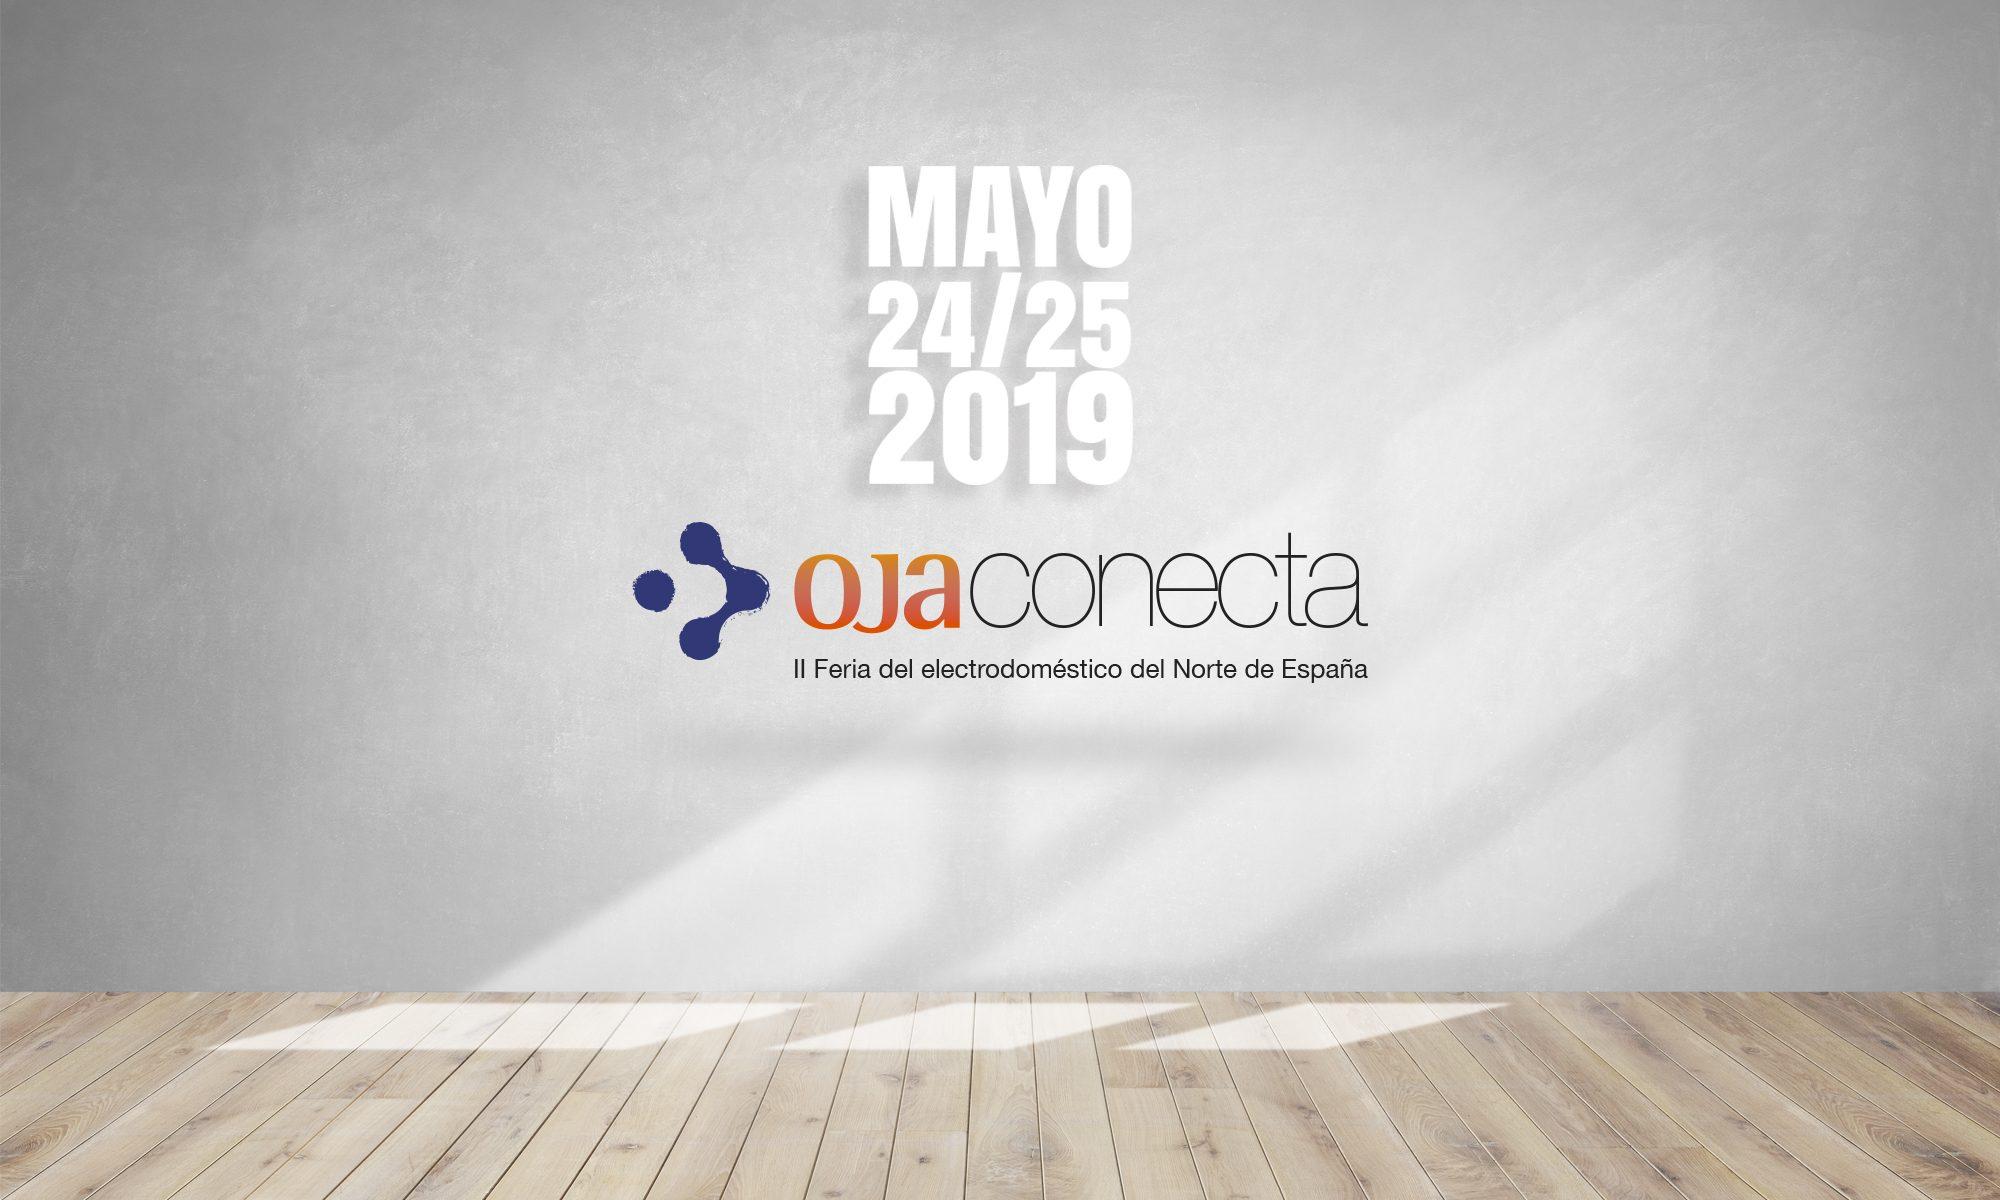 OJACONECTA 2019